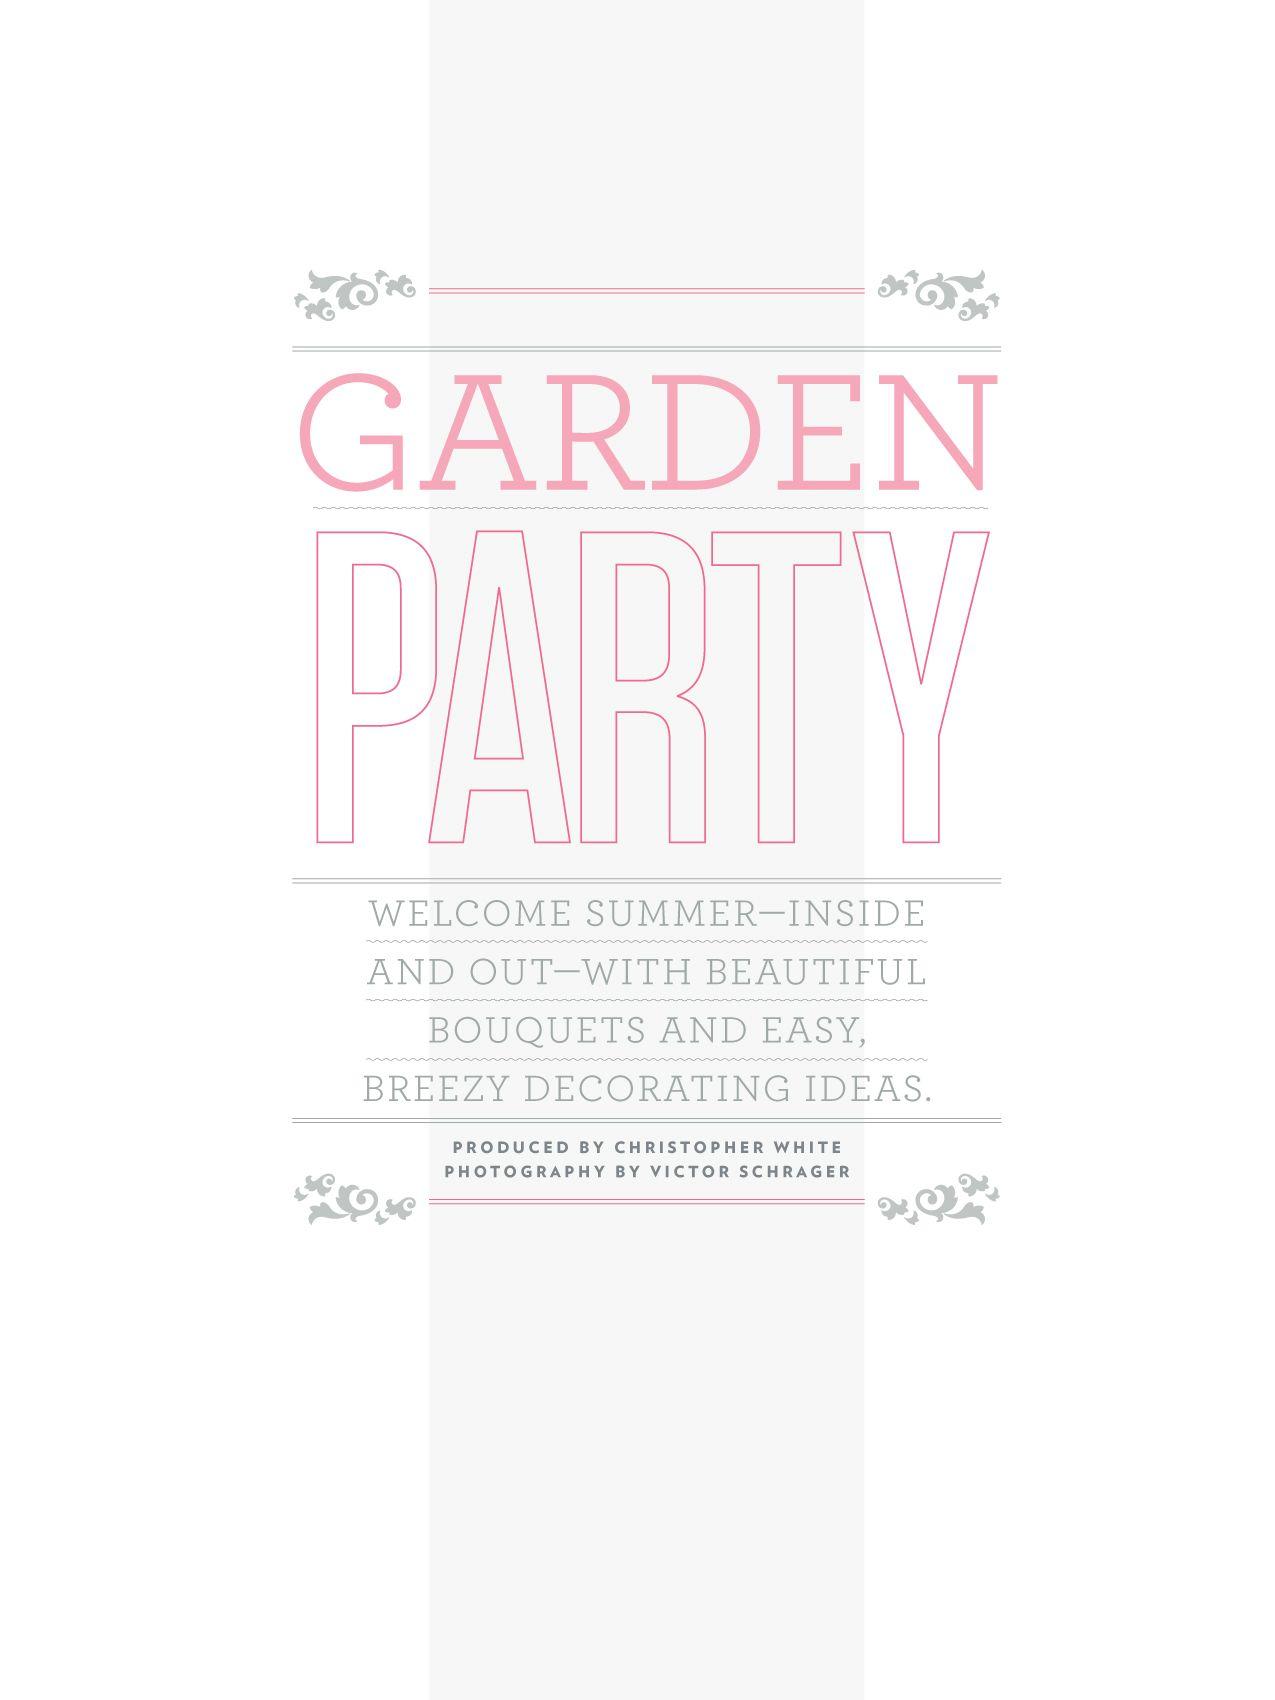 ChristopherWhite-FamilyCircle-garden_party-1.jpg